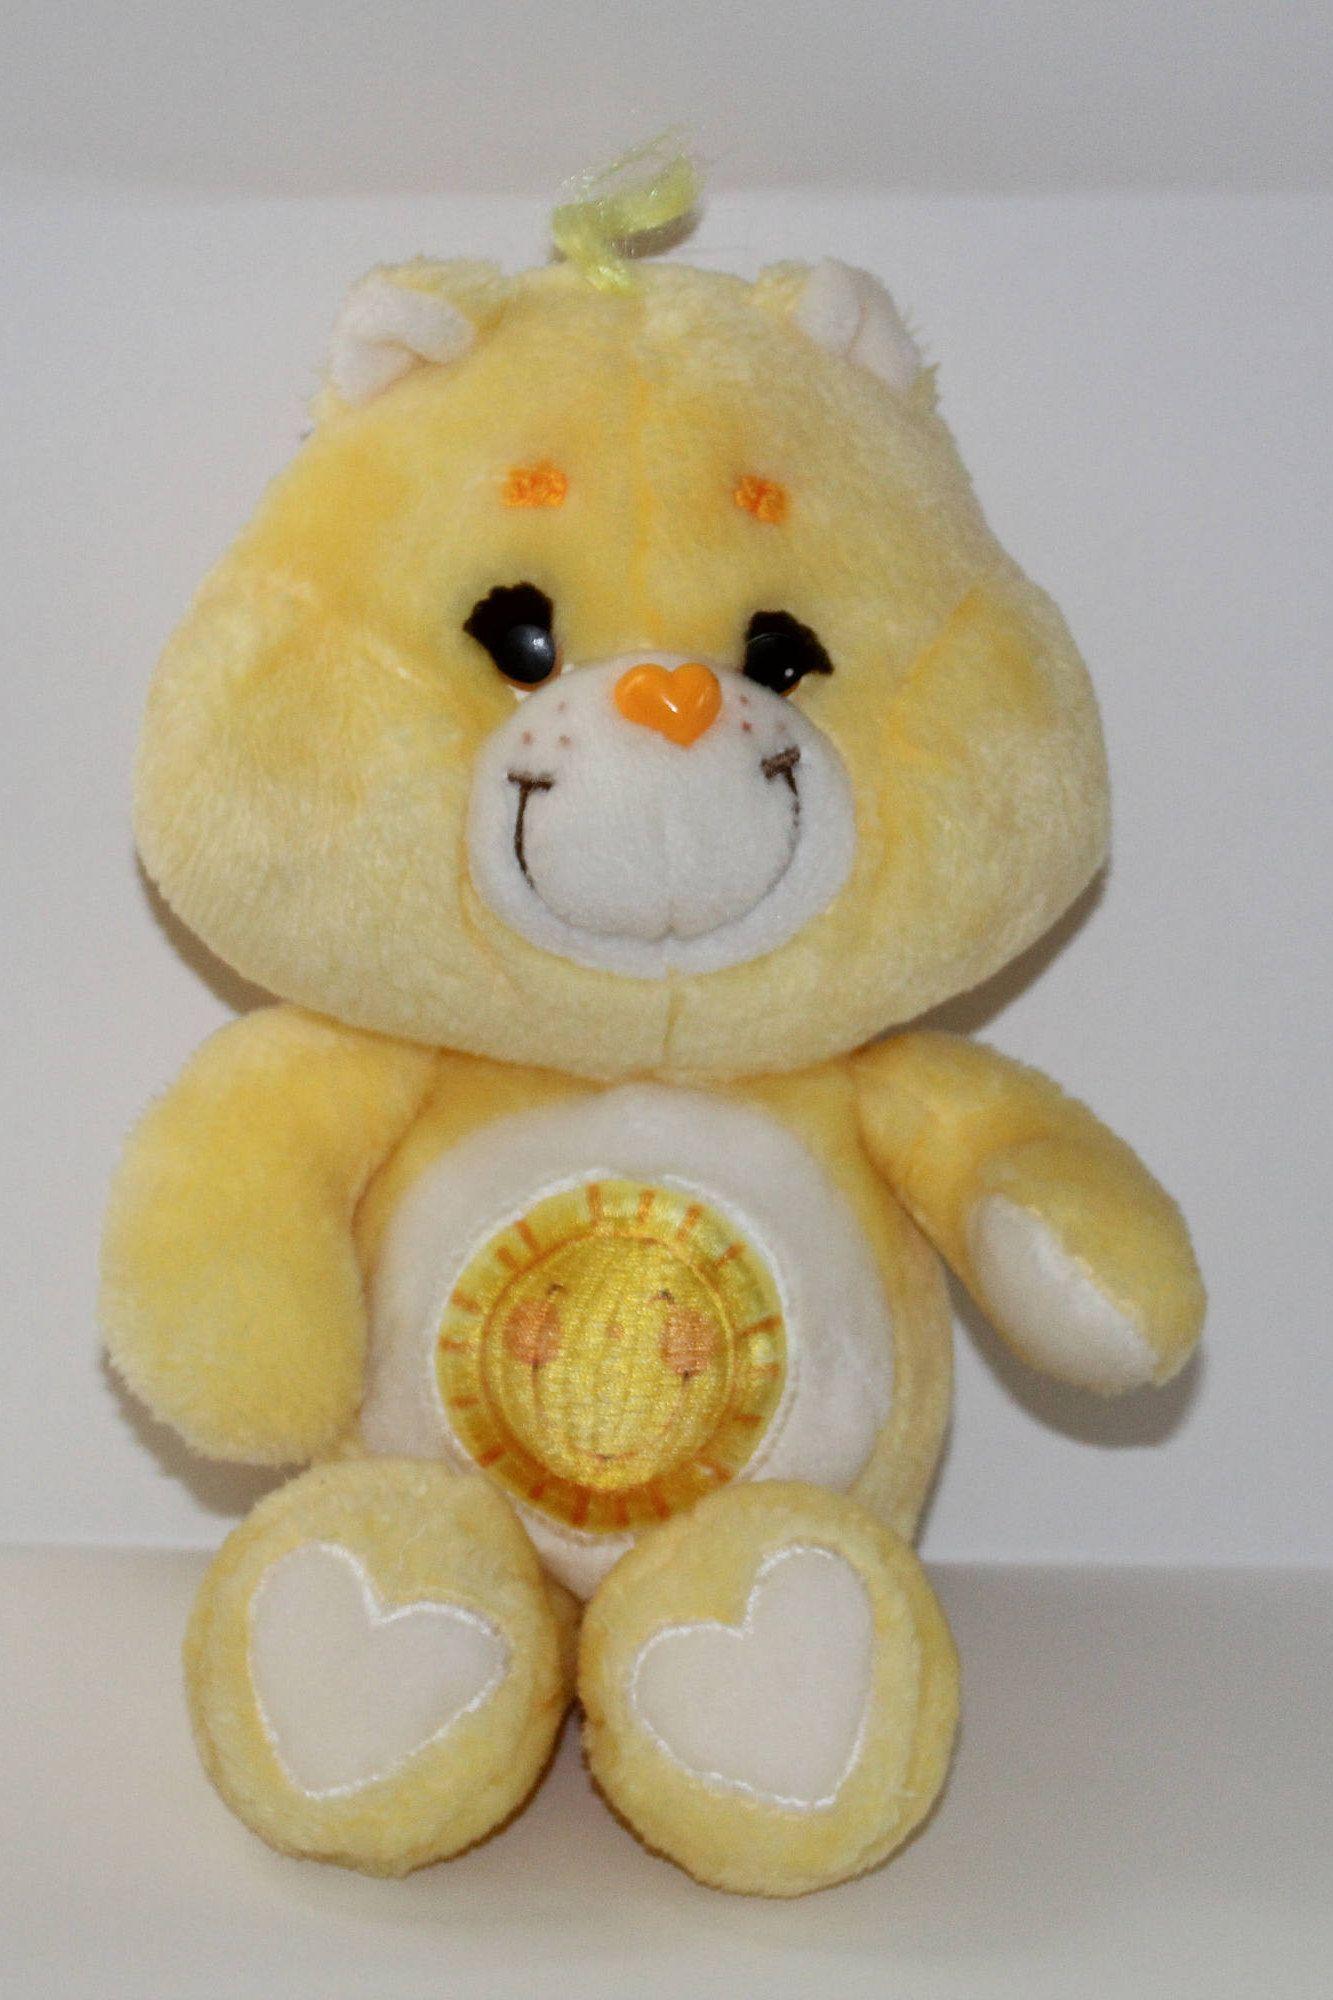 The yellow Birthday Care Bear